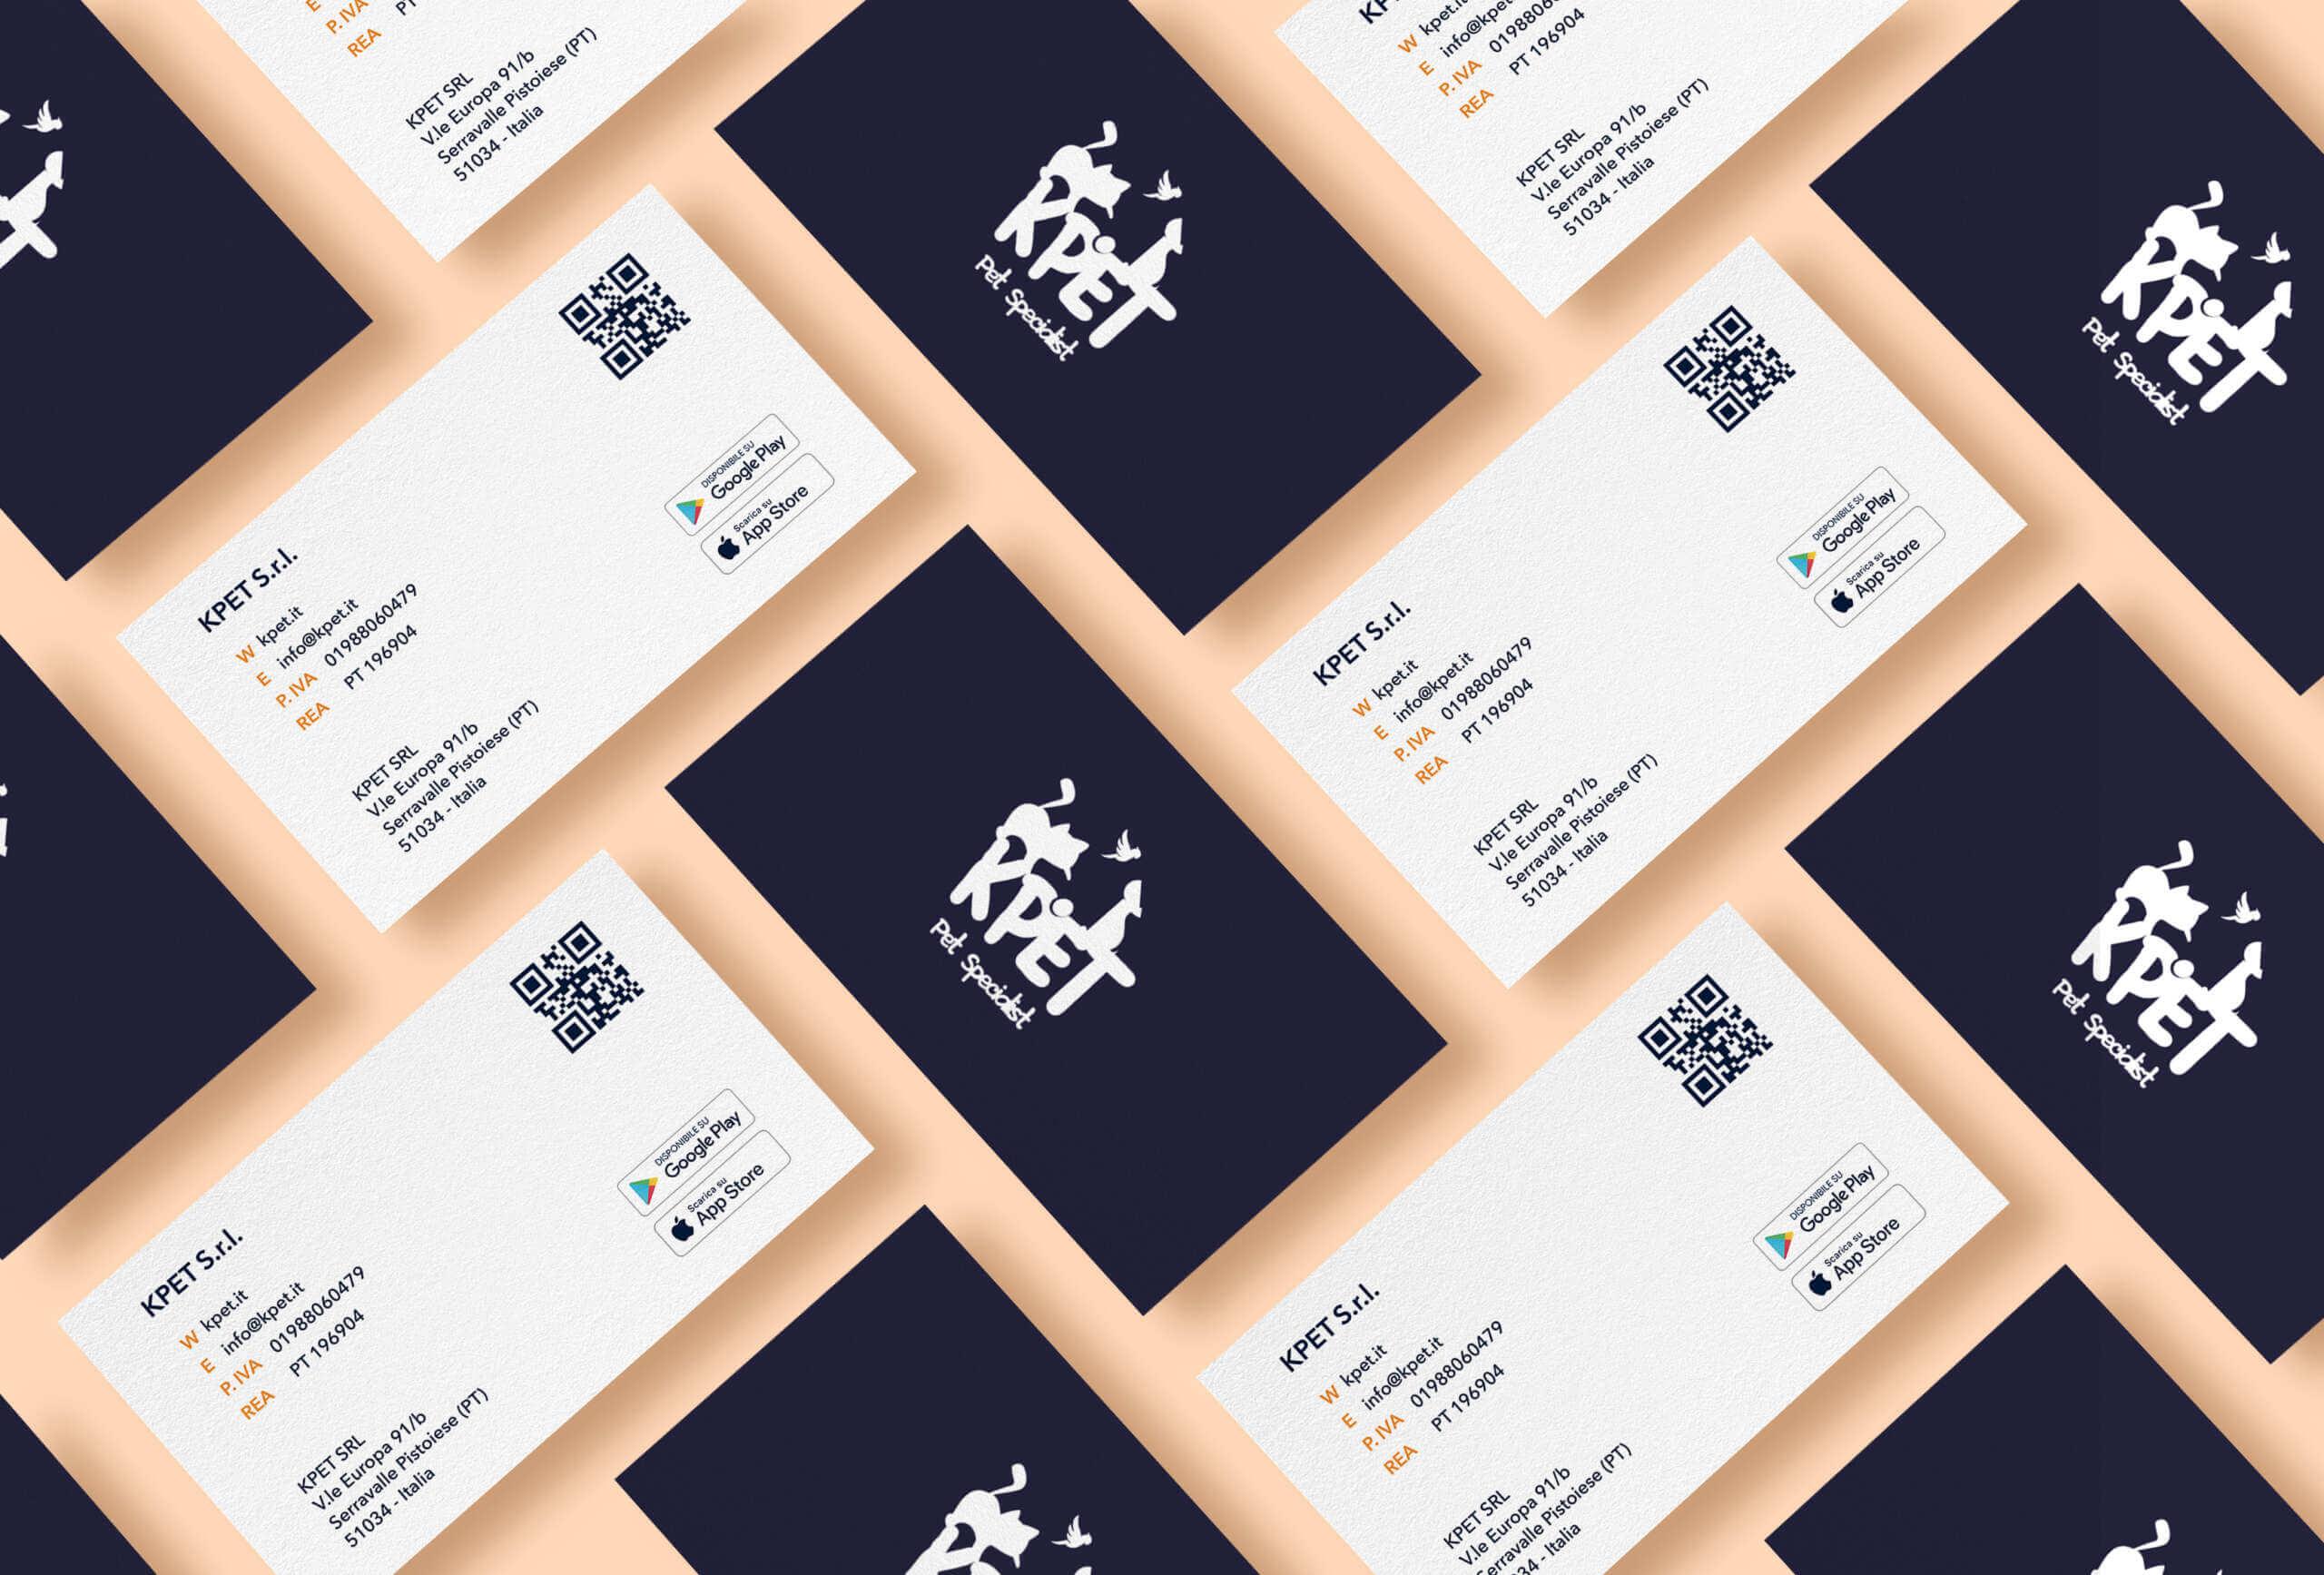 Kpet - Business card - Carpediem srl